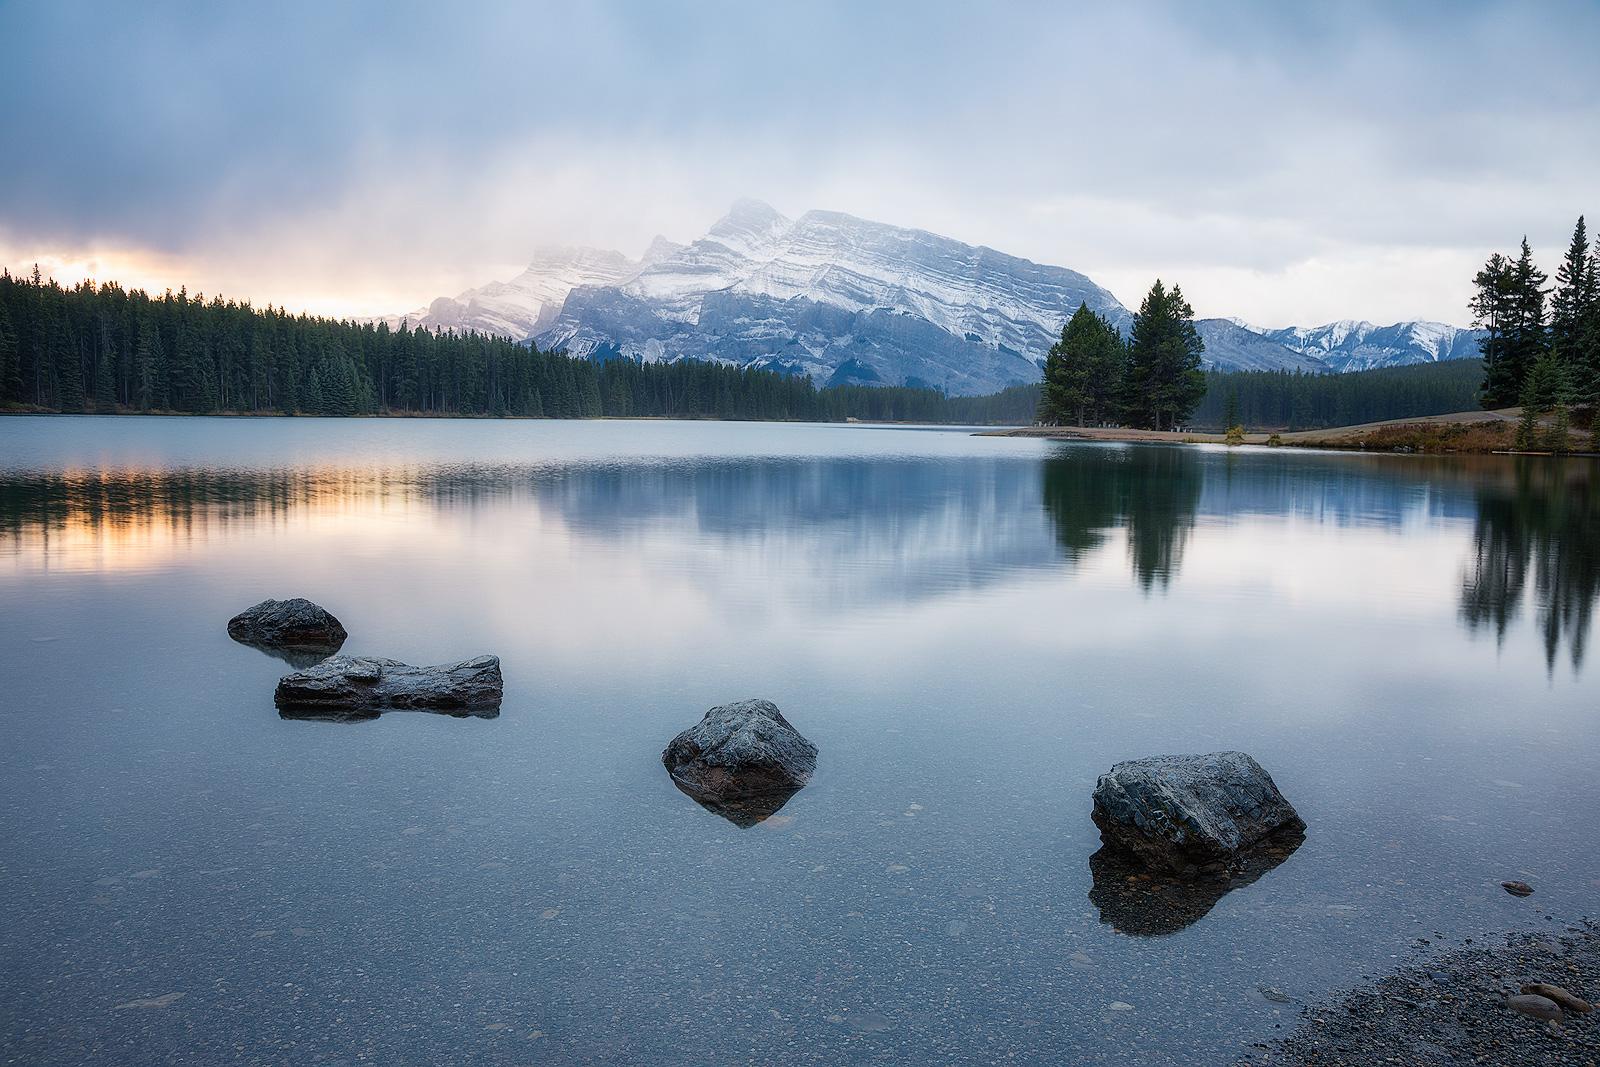 alberta, banff, canada, canadian rockies, clouds, horizontal, lake, landscape, morning, mount rundle, mountain, north america, peak, sunrise, two-jack lake, water body, photo